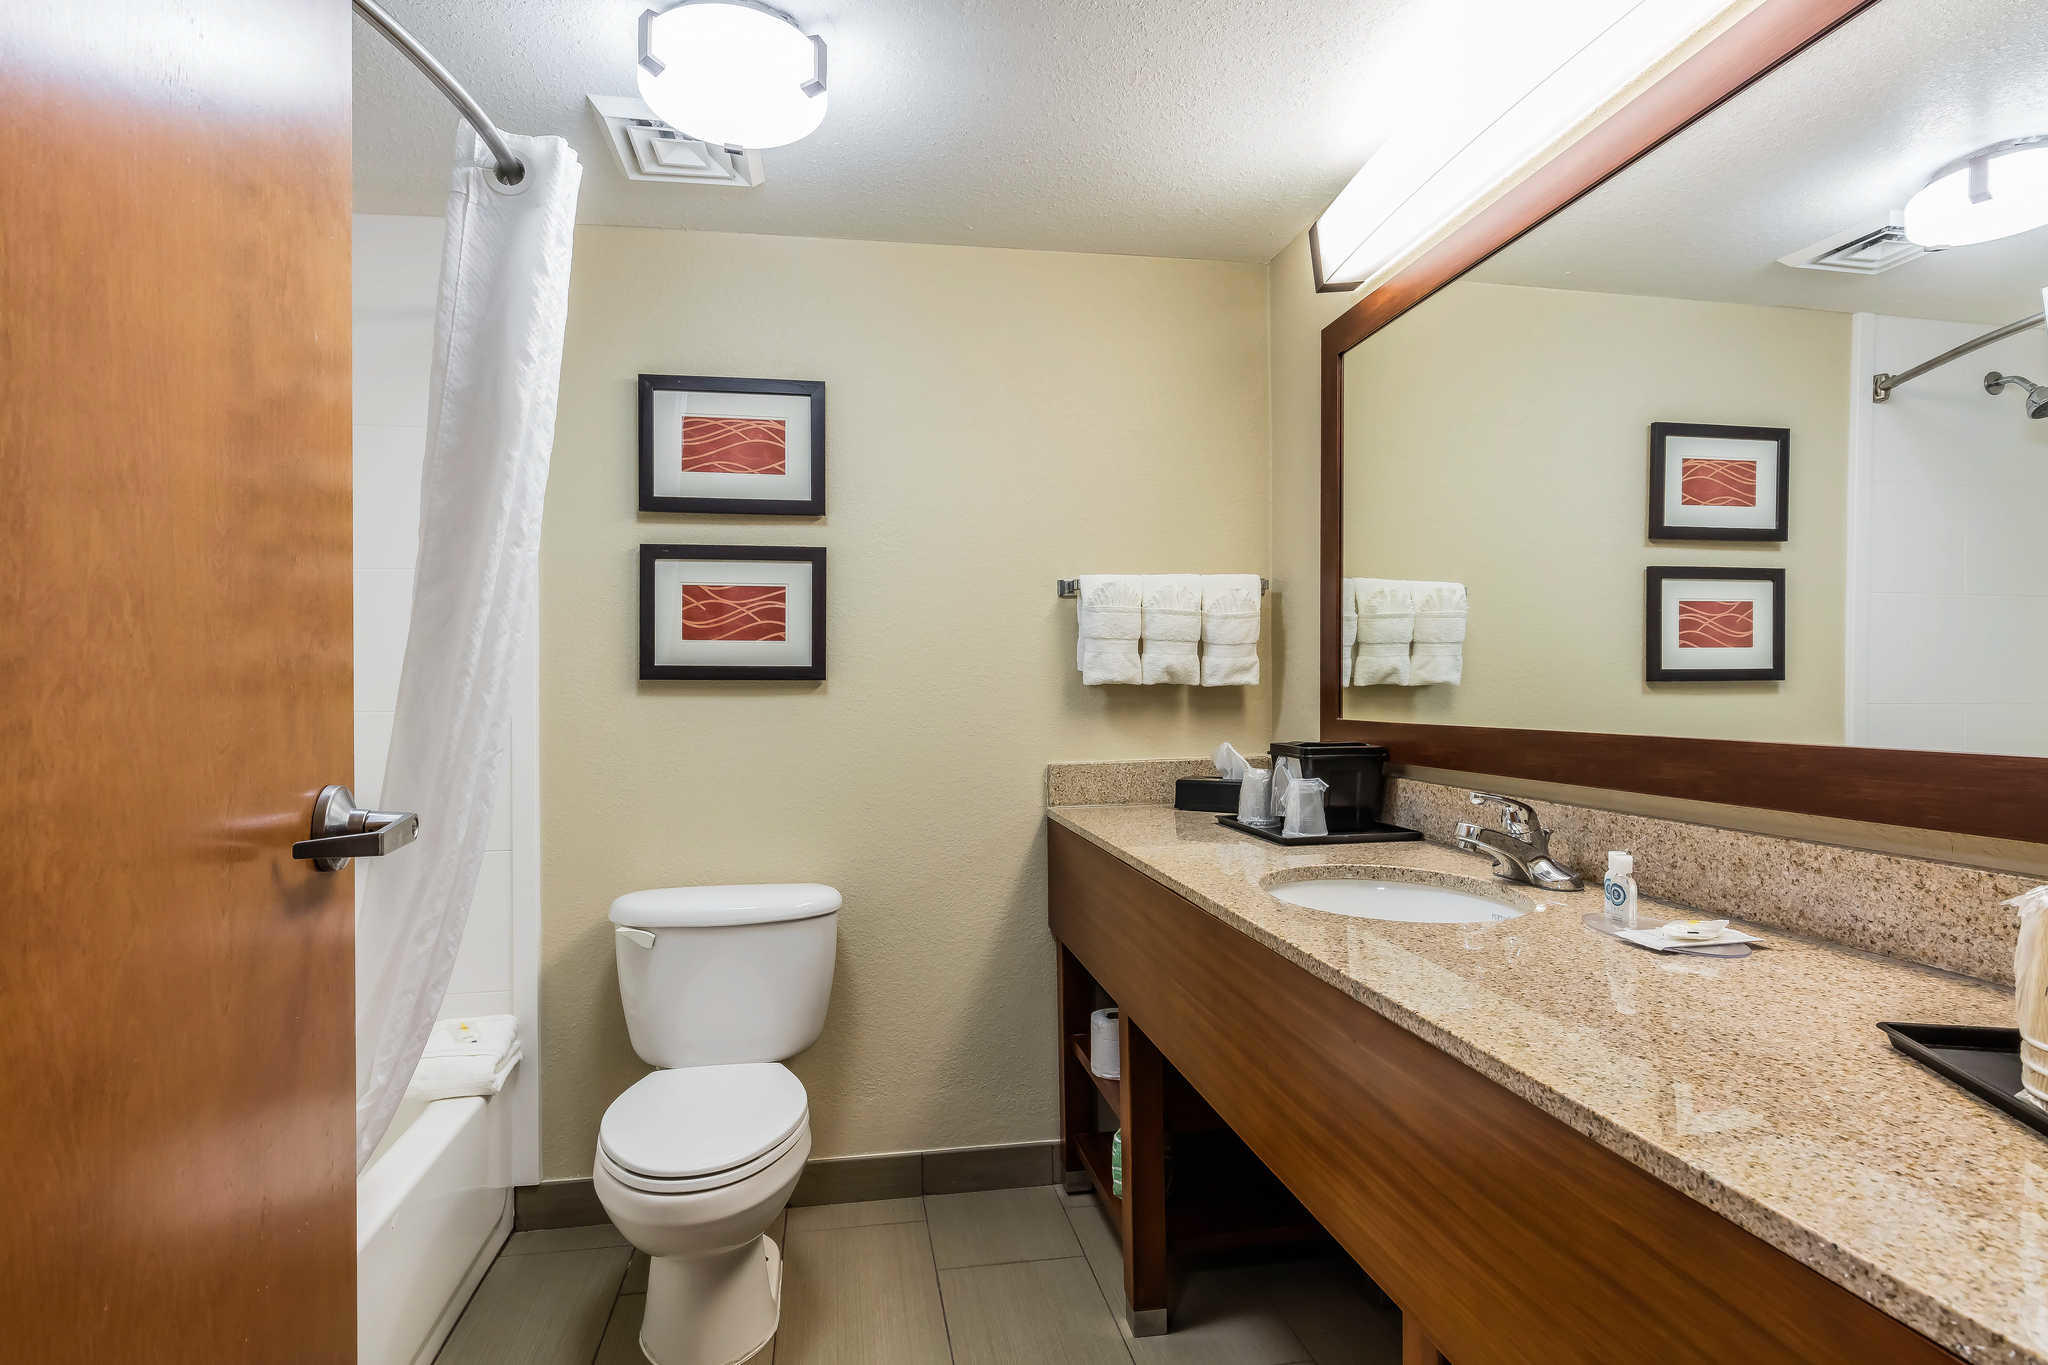 Comfort Inn & Suites Airport-American Way image 11